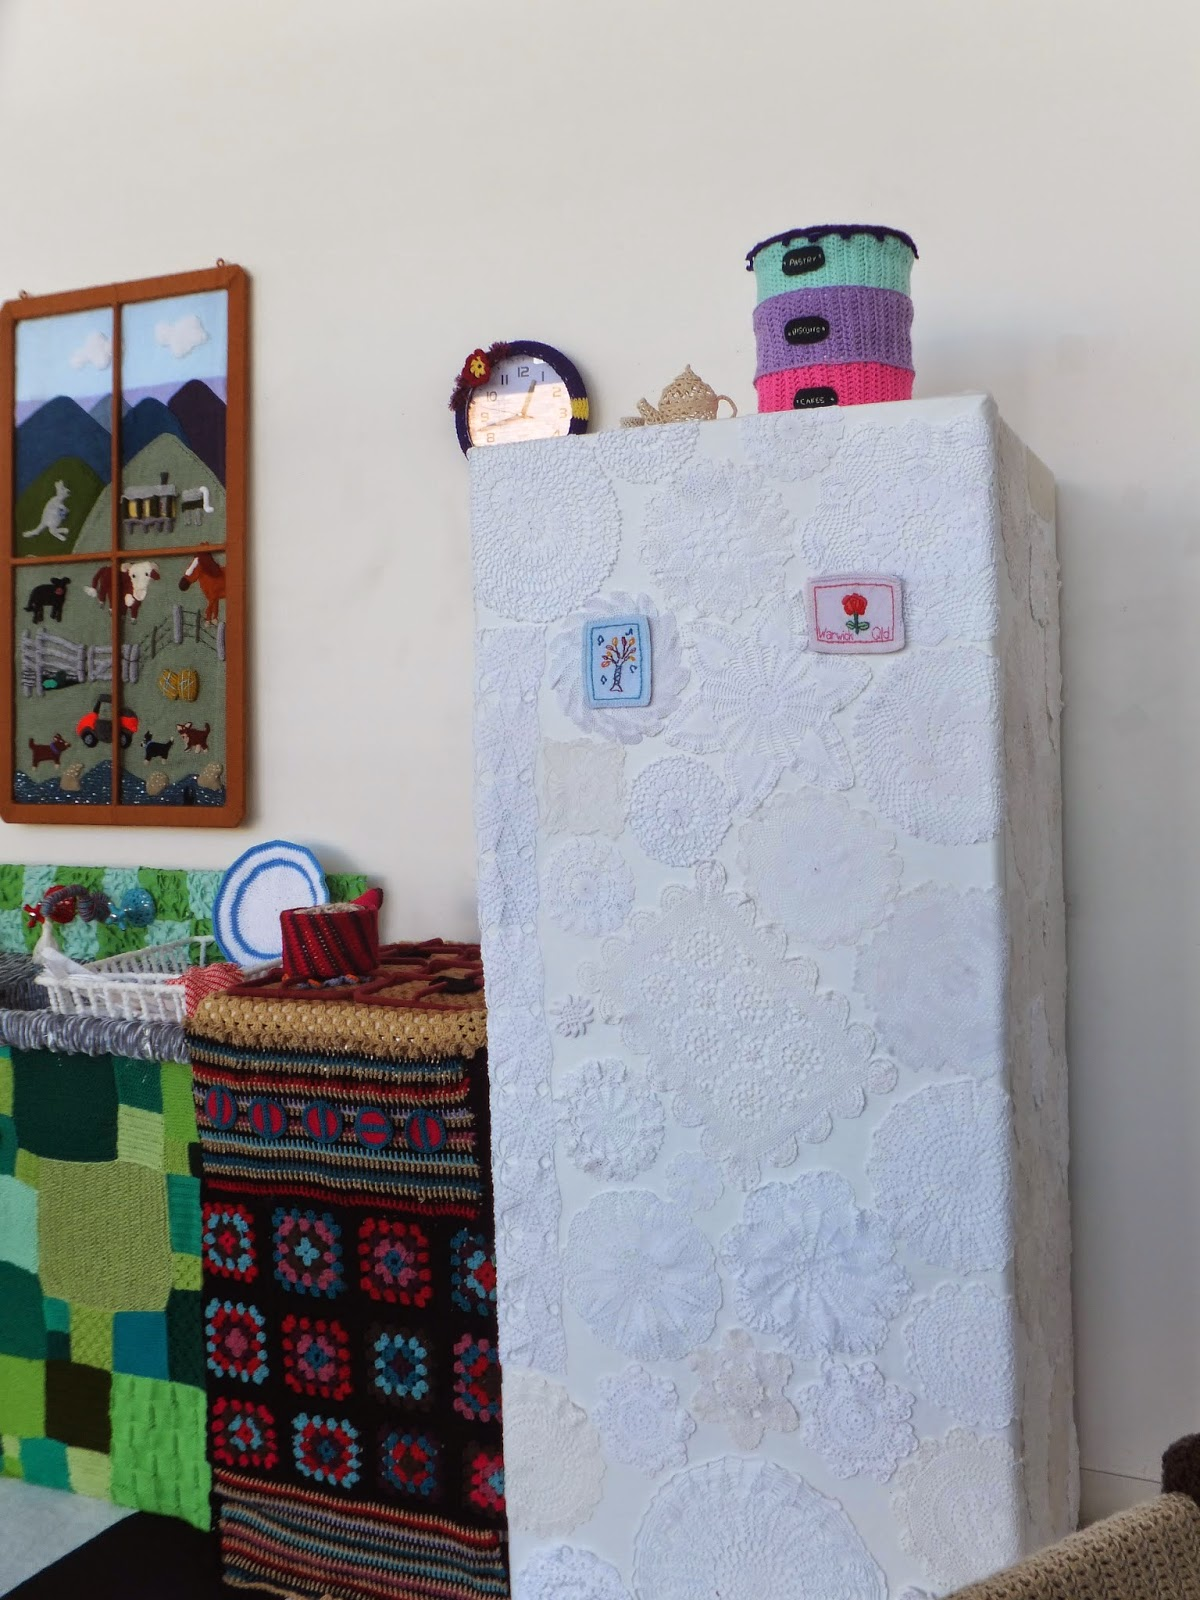 yarn-bombing-warwick-art-gallery-04